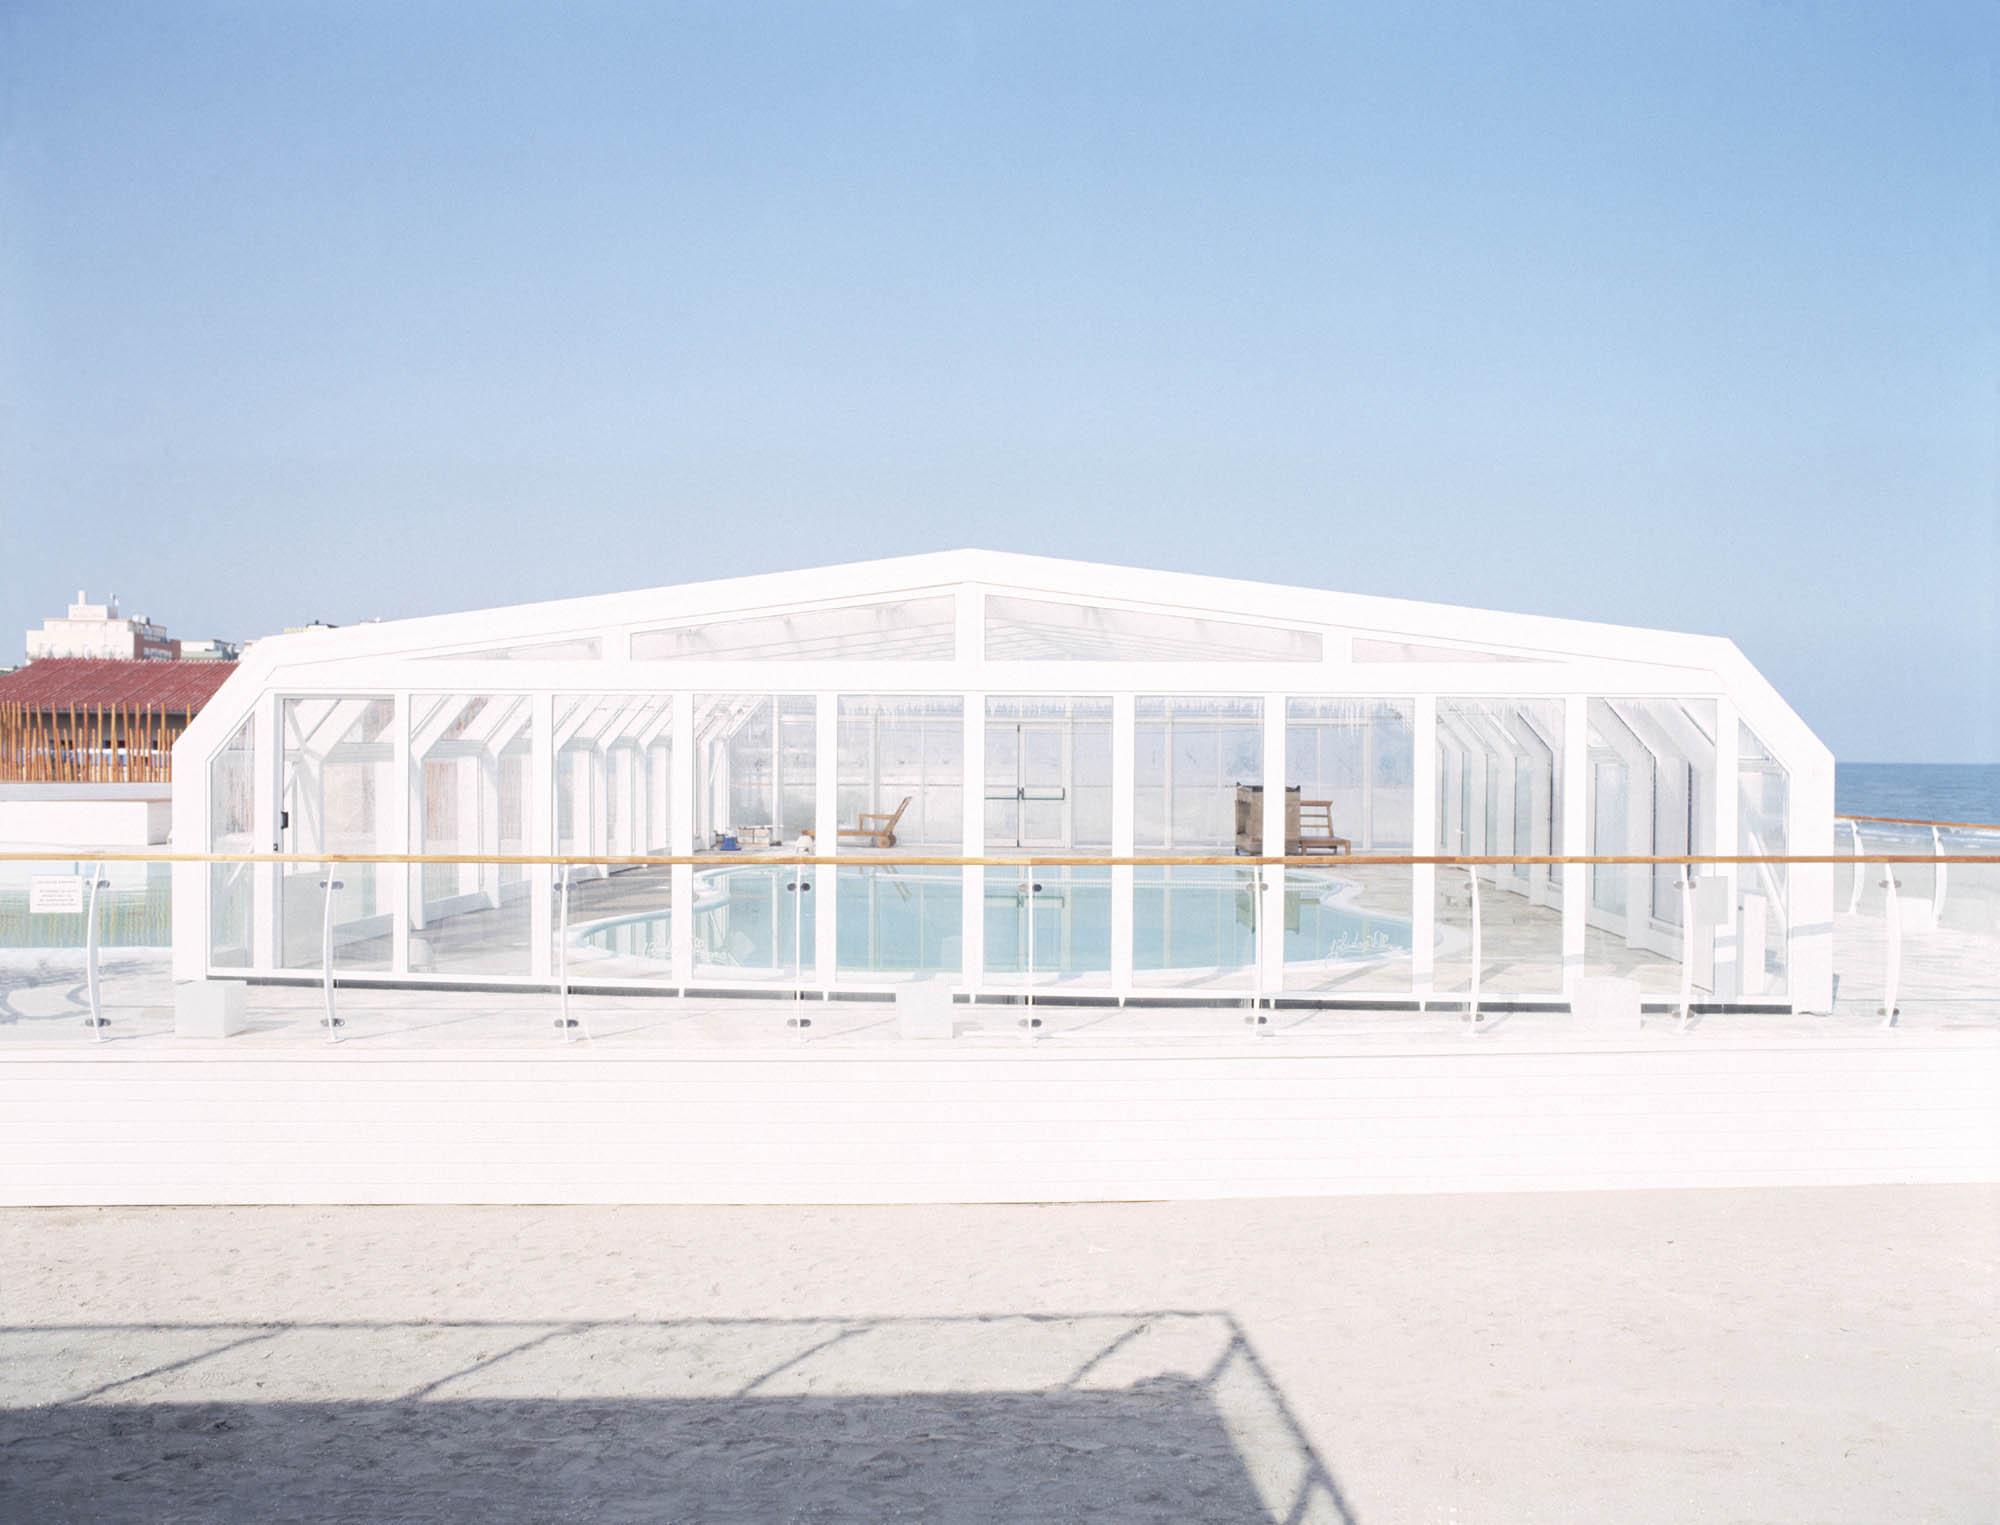 'Indoor Swimming-Pool, Milano Marittima', Archival pigment print